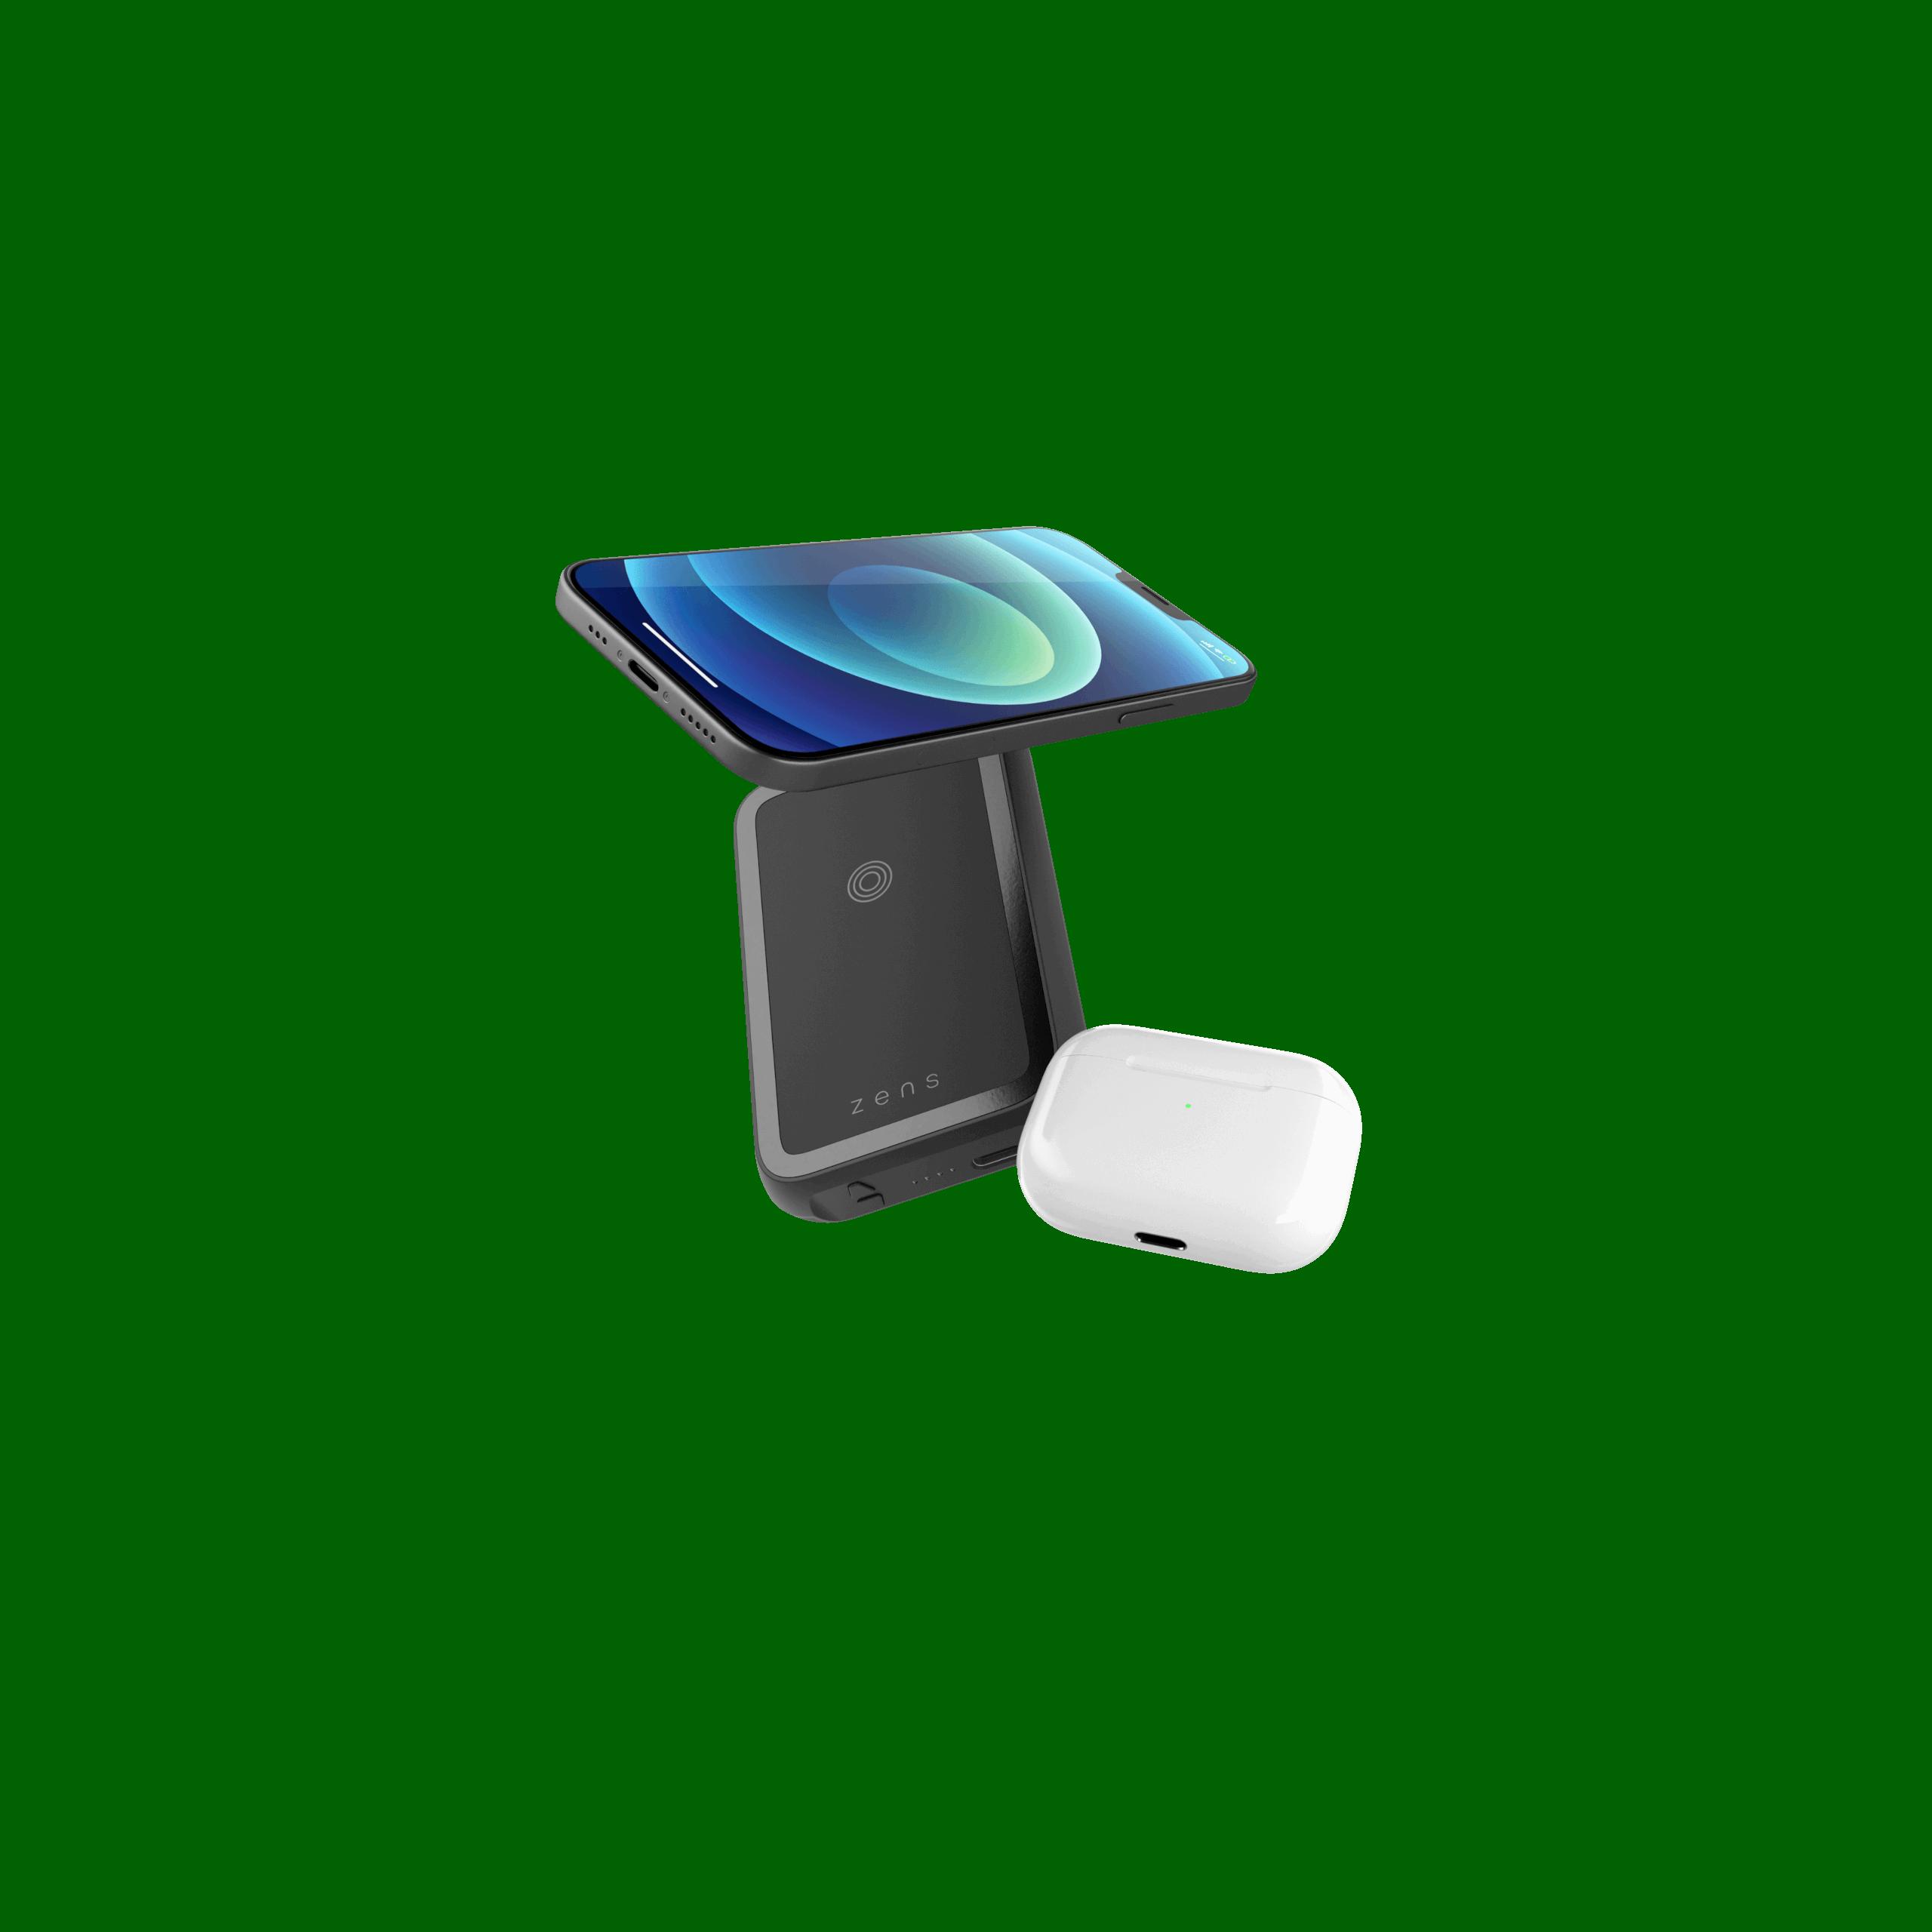 MagSafe compatible Powerbanks